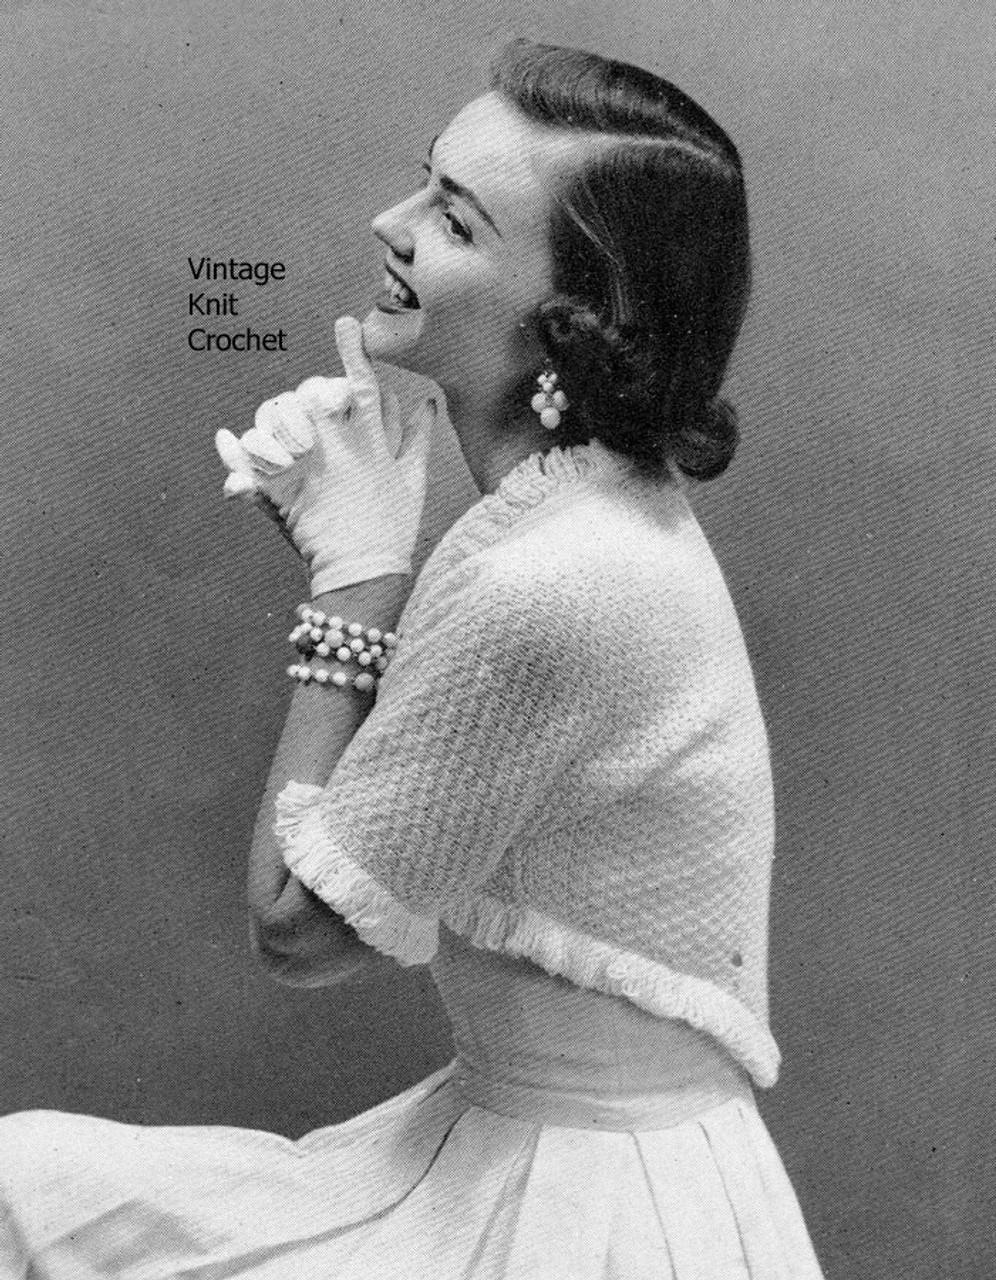 Vintage Knitted Shrug Pattern, Loop Stitch Trim